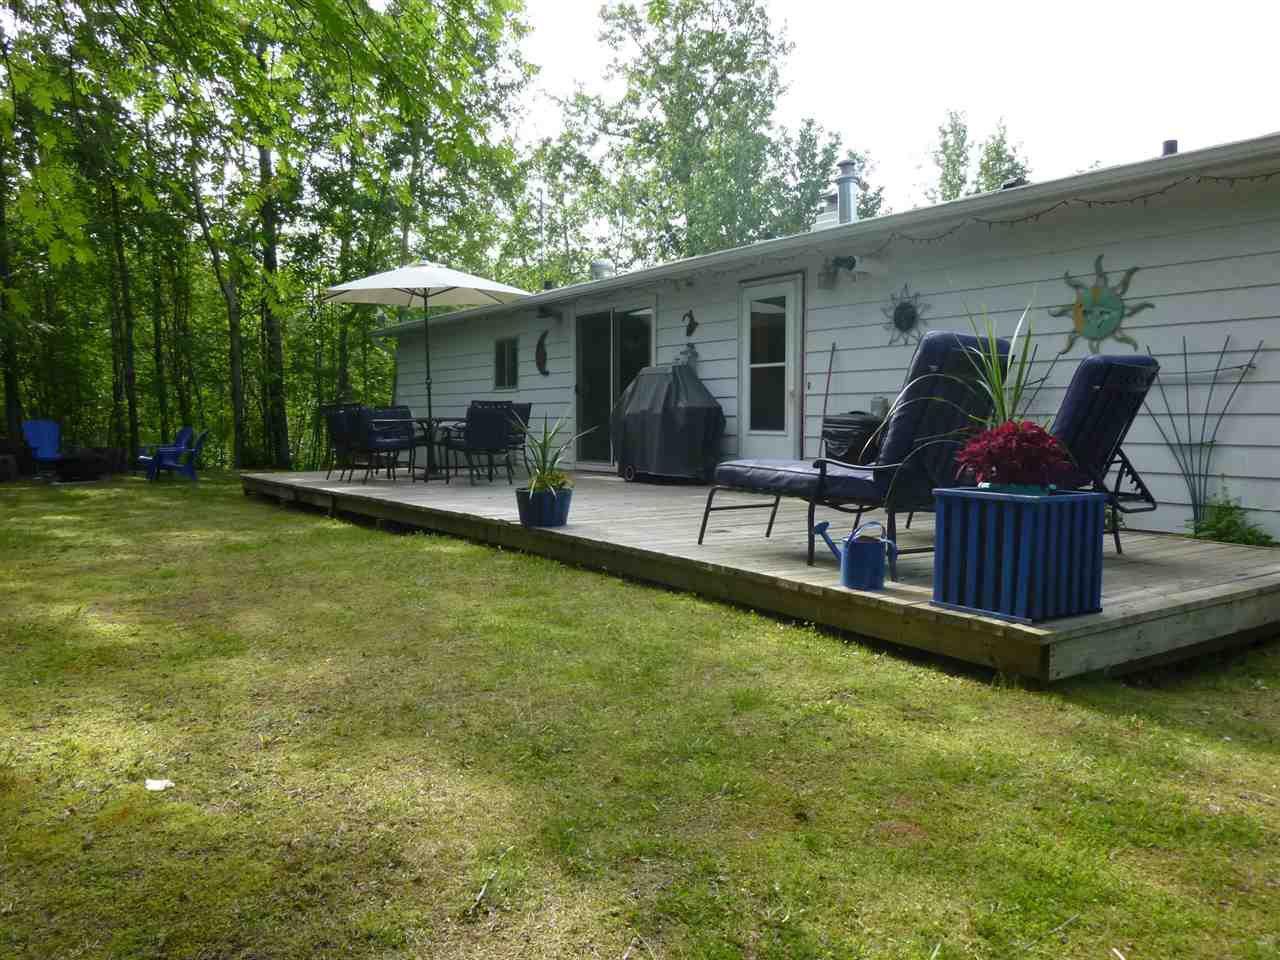 Main Photo: 619 6th Street: Rural Wetaskiwin County House for sale : MLS®# E4203421